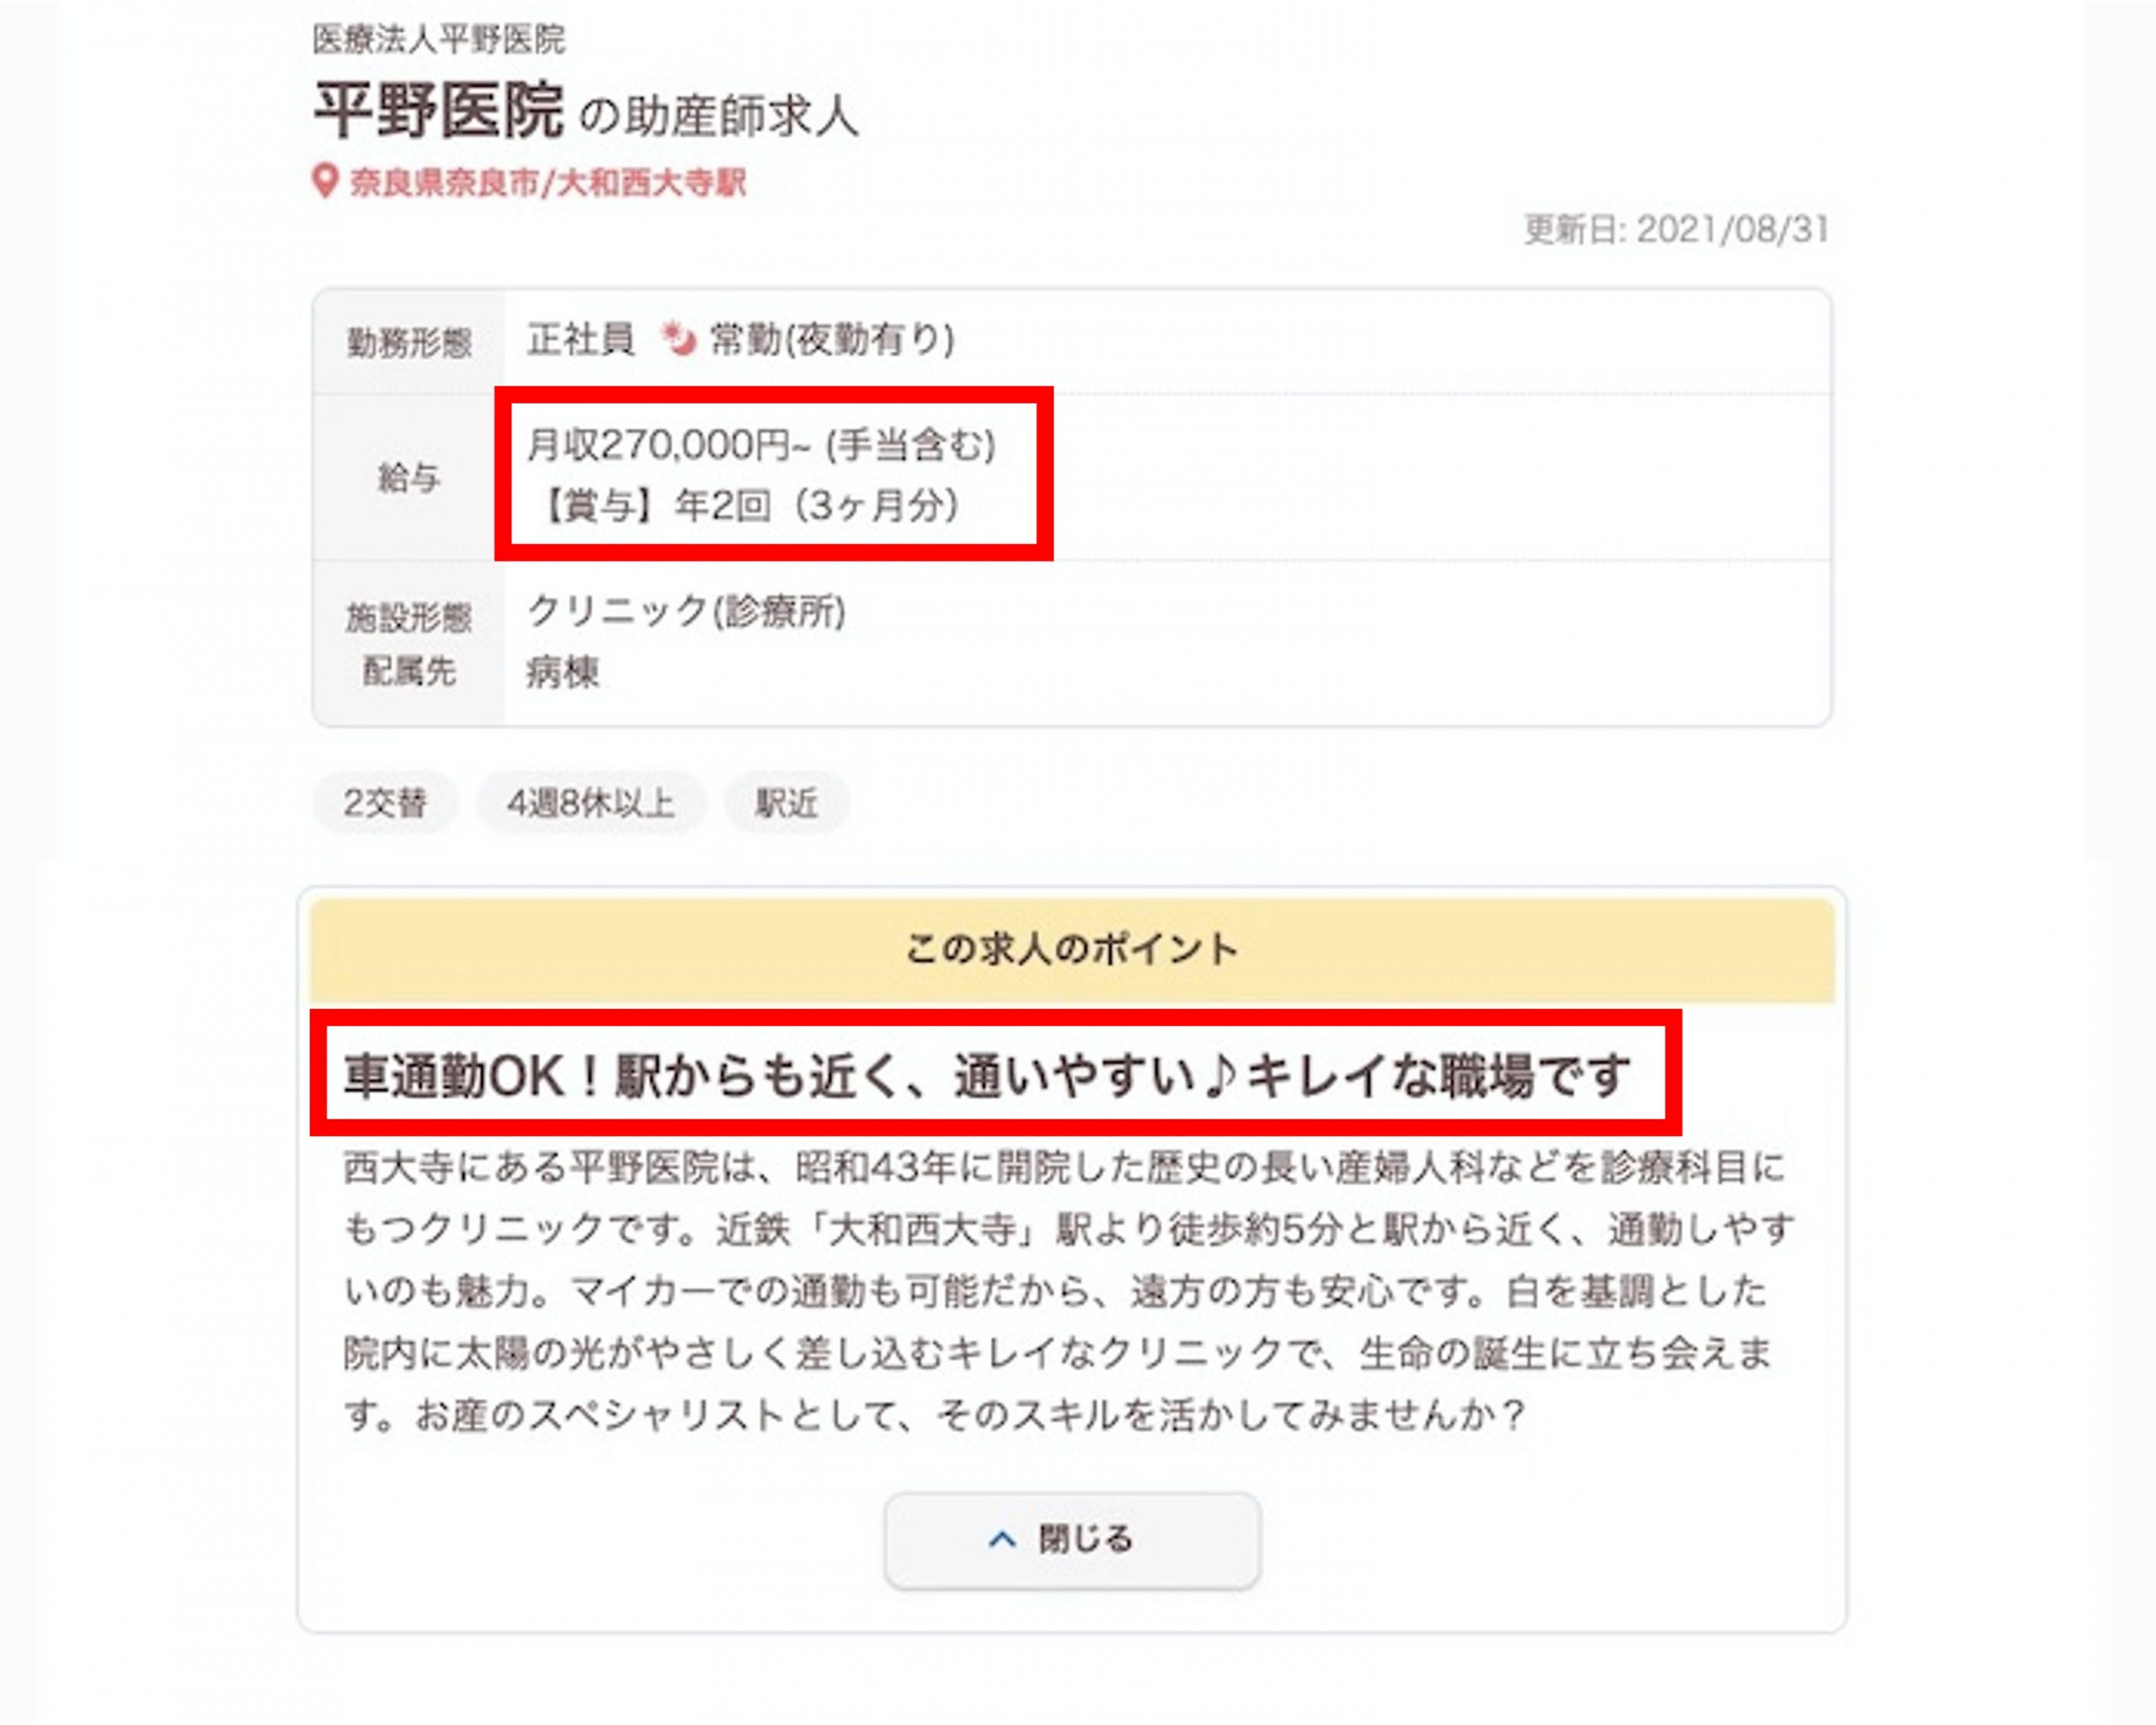 奈良県 看護師転職サイト 求人情報